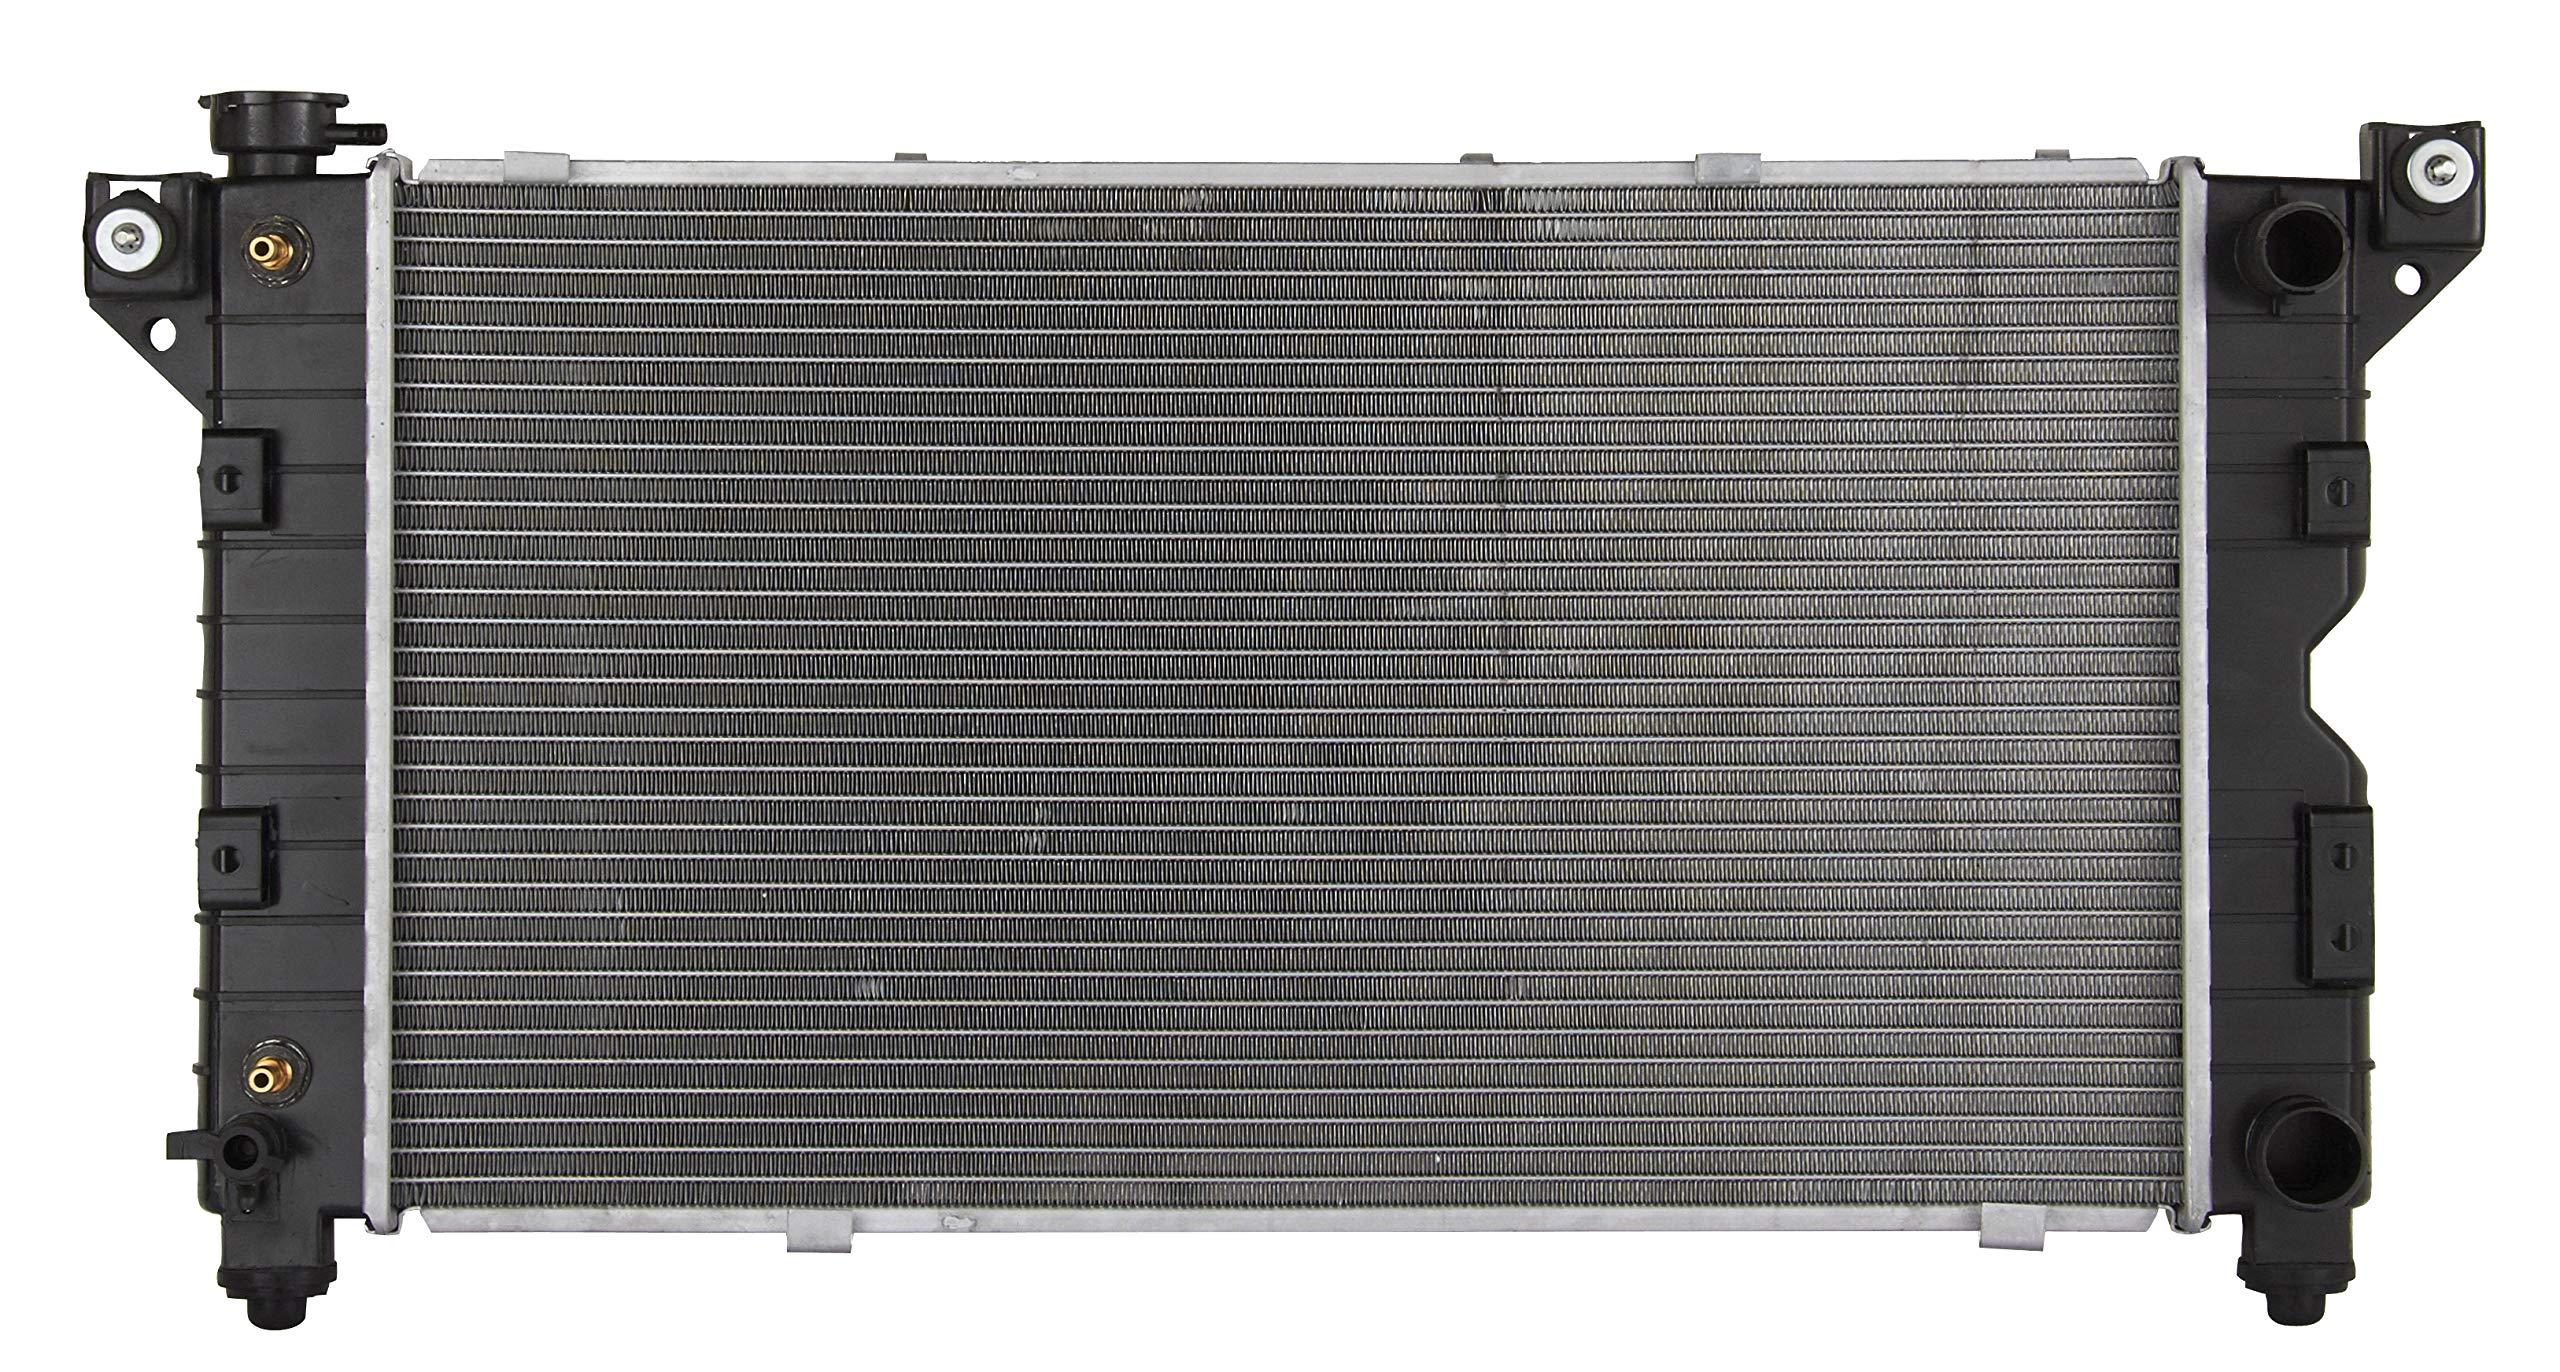 Spectra Premium CU1850 Complete Radiator for Chrysler/Dodge